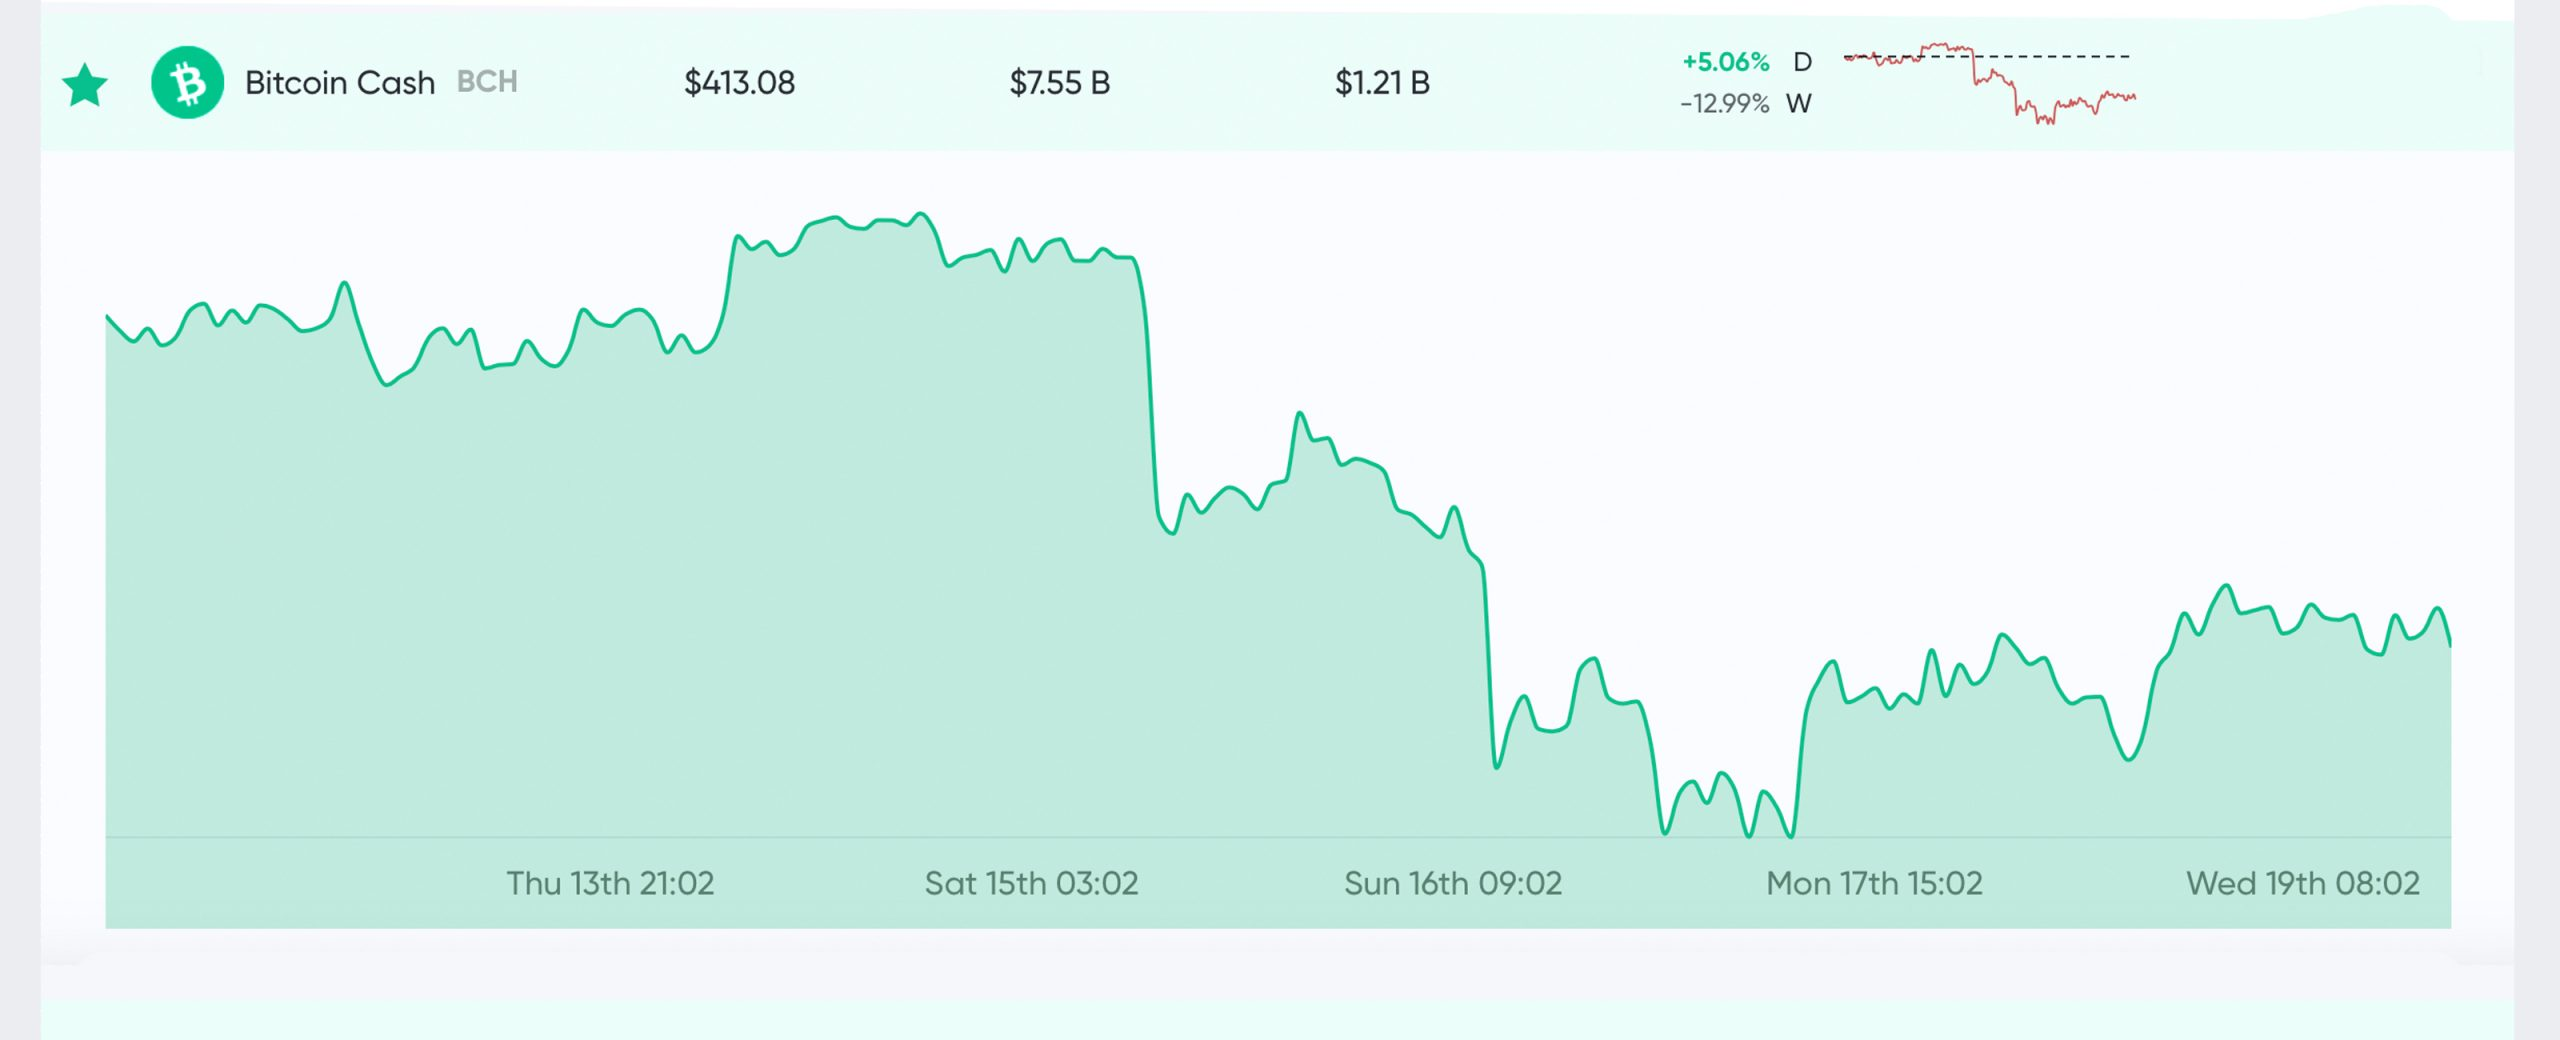 Market Update: Bitcoin Halving Hype, Golden Cross Signals, and GBTC's 41% Premium